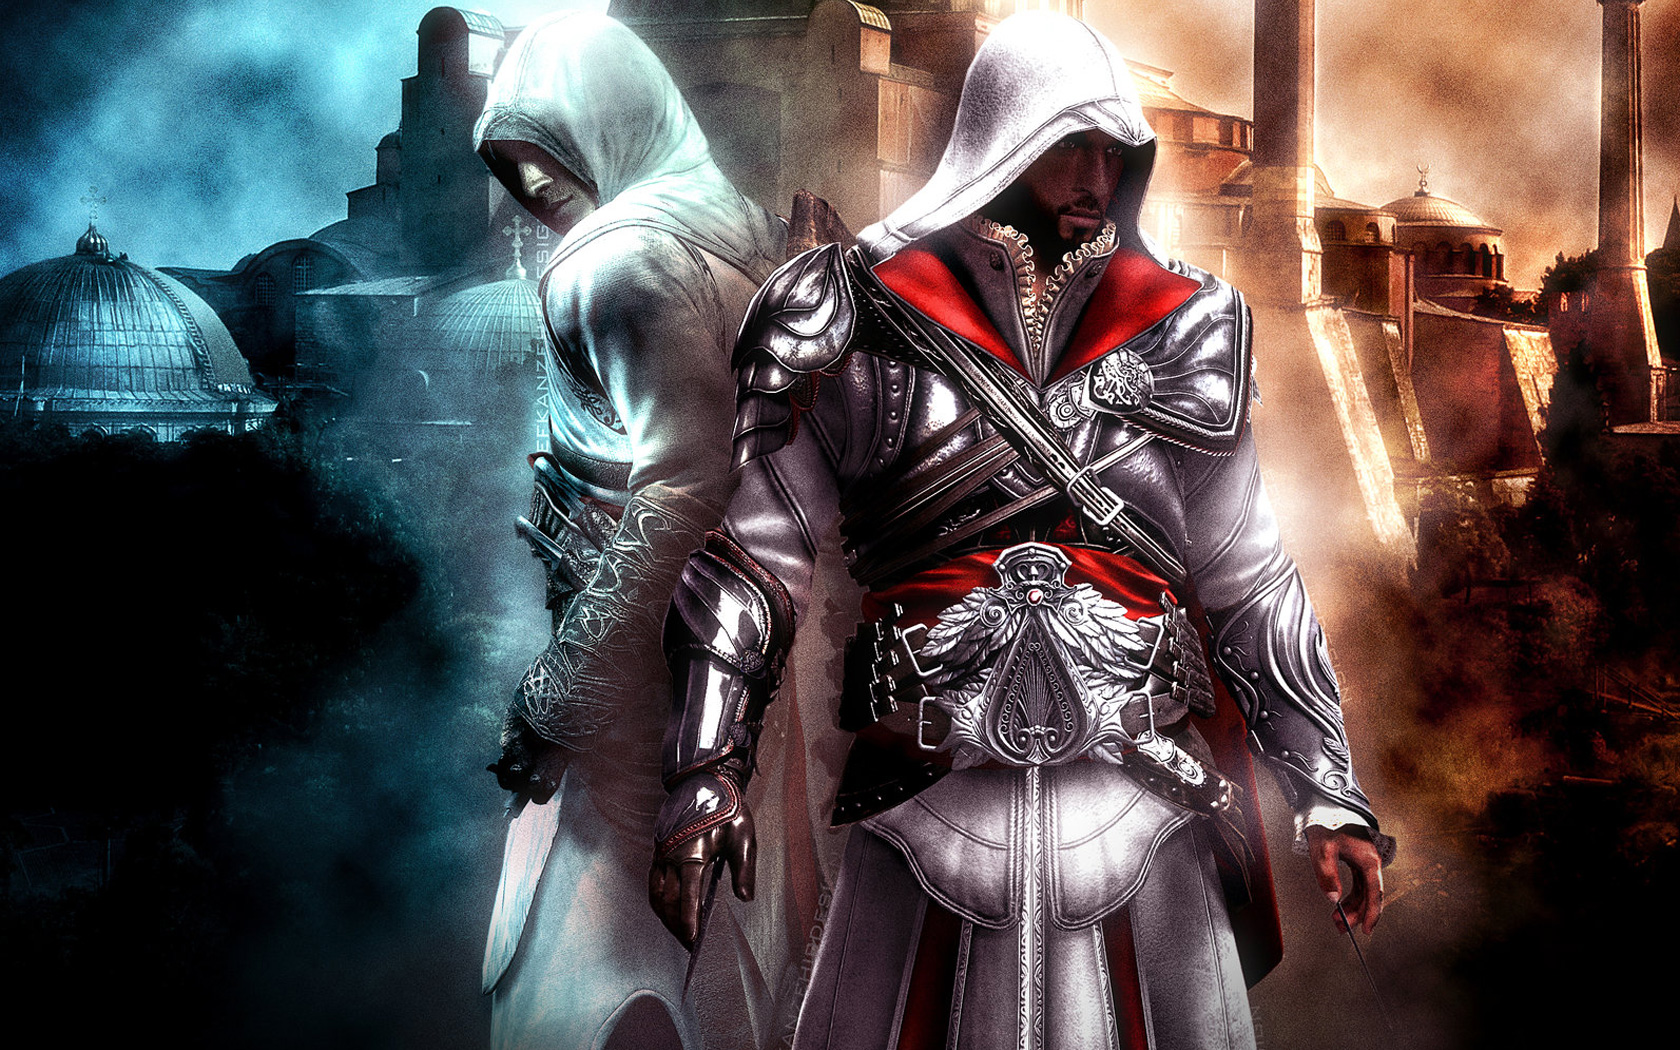 Assassin Creed Full HD Wallpaper 1080p Imagenes 1680x1050